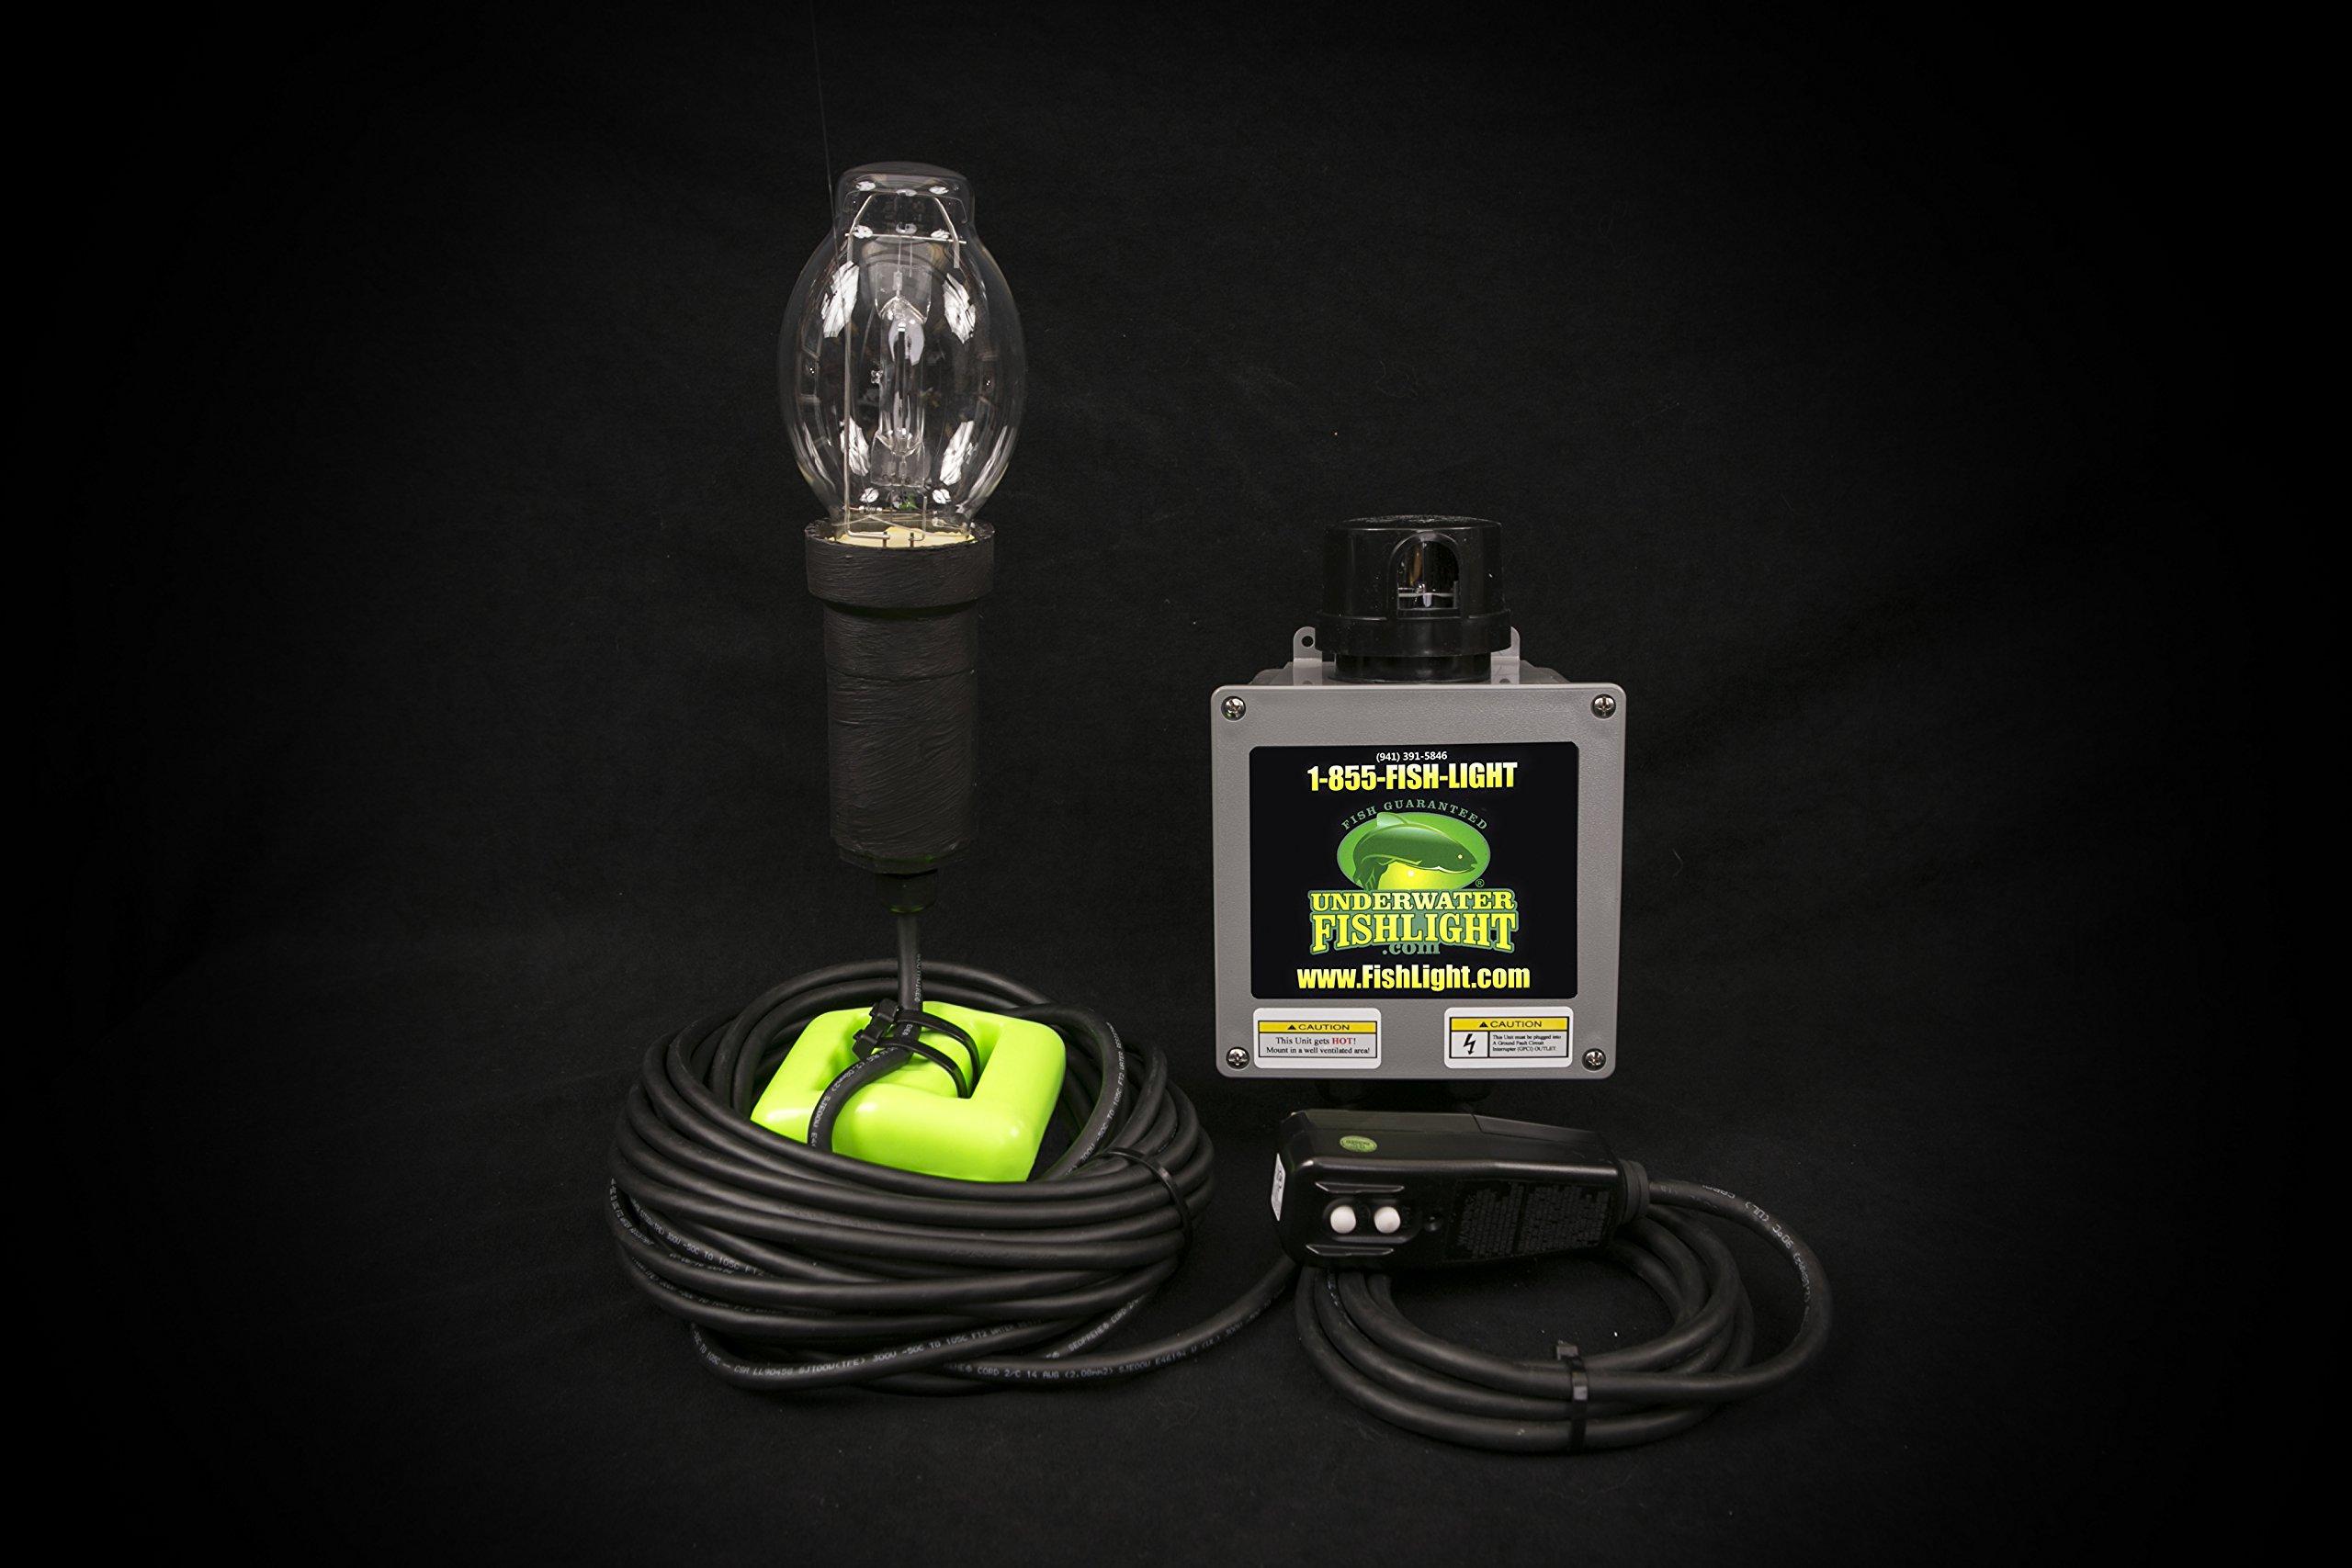 Underwater Fish Light - Single Bulb Underwater Dock Light 50ft Wire